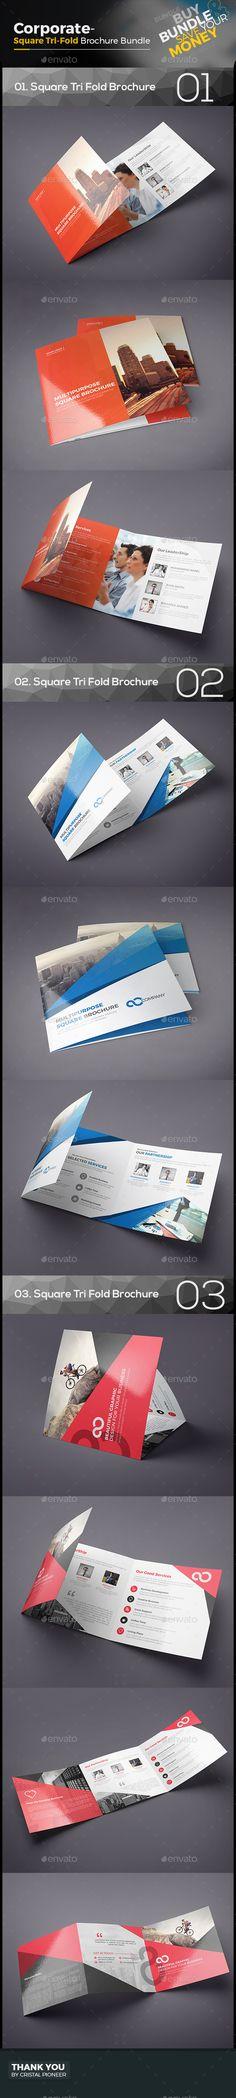 3 Square Tri Fold Brochure Bundle Templates Vector EPS, AI Illustrator. Download here: http://graphicriver.net/item/square-tri-fold-brochure-bundle-3-in-1/16607437?ref=ksioks